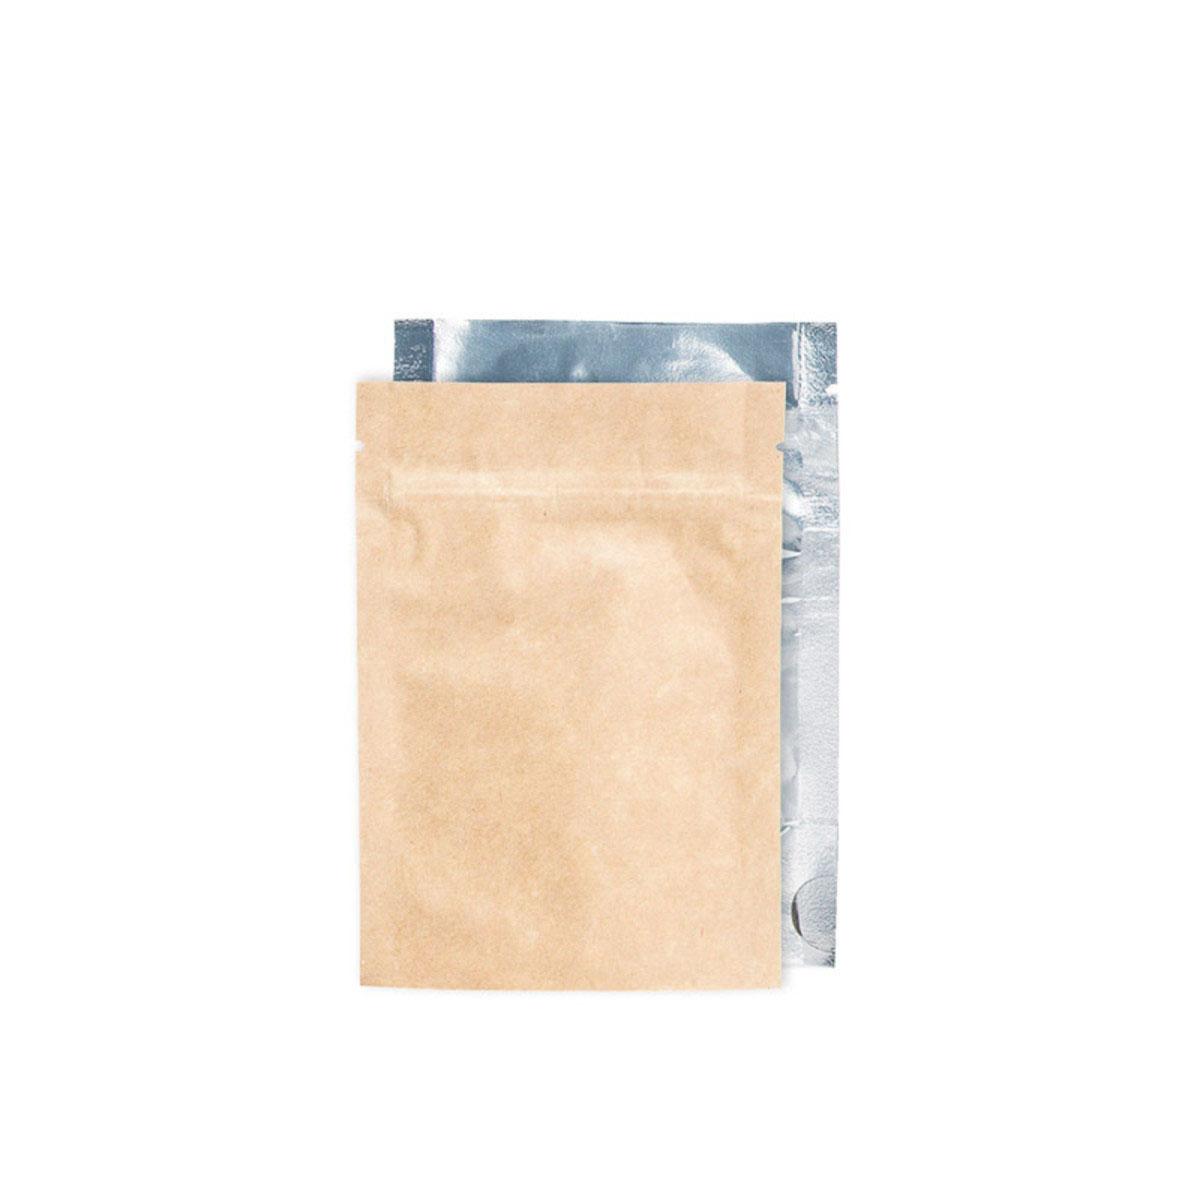 Eighth Ounce Kraft/clear Barrier Bags (100 Qty.)